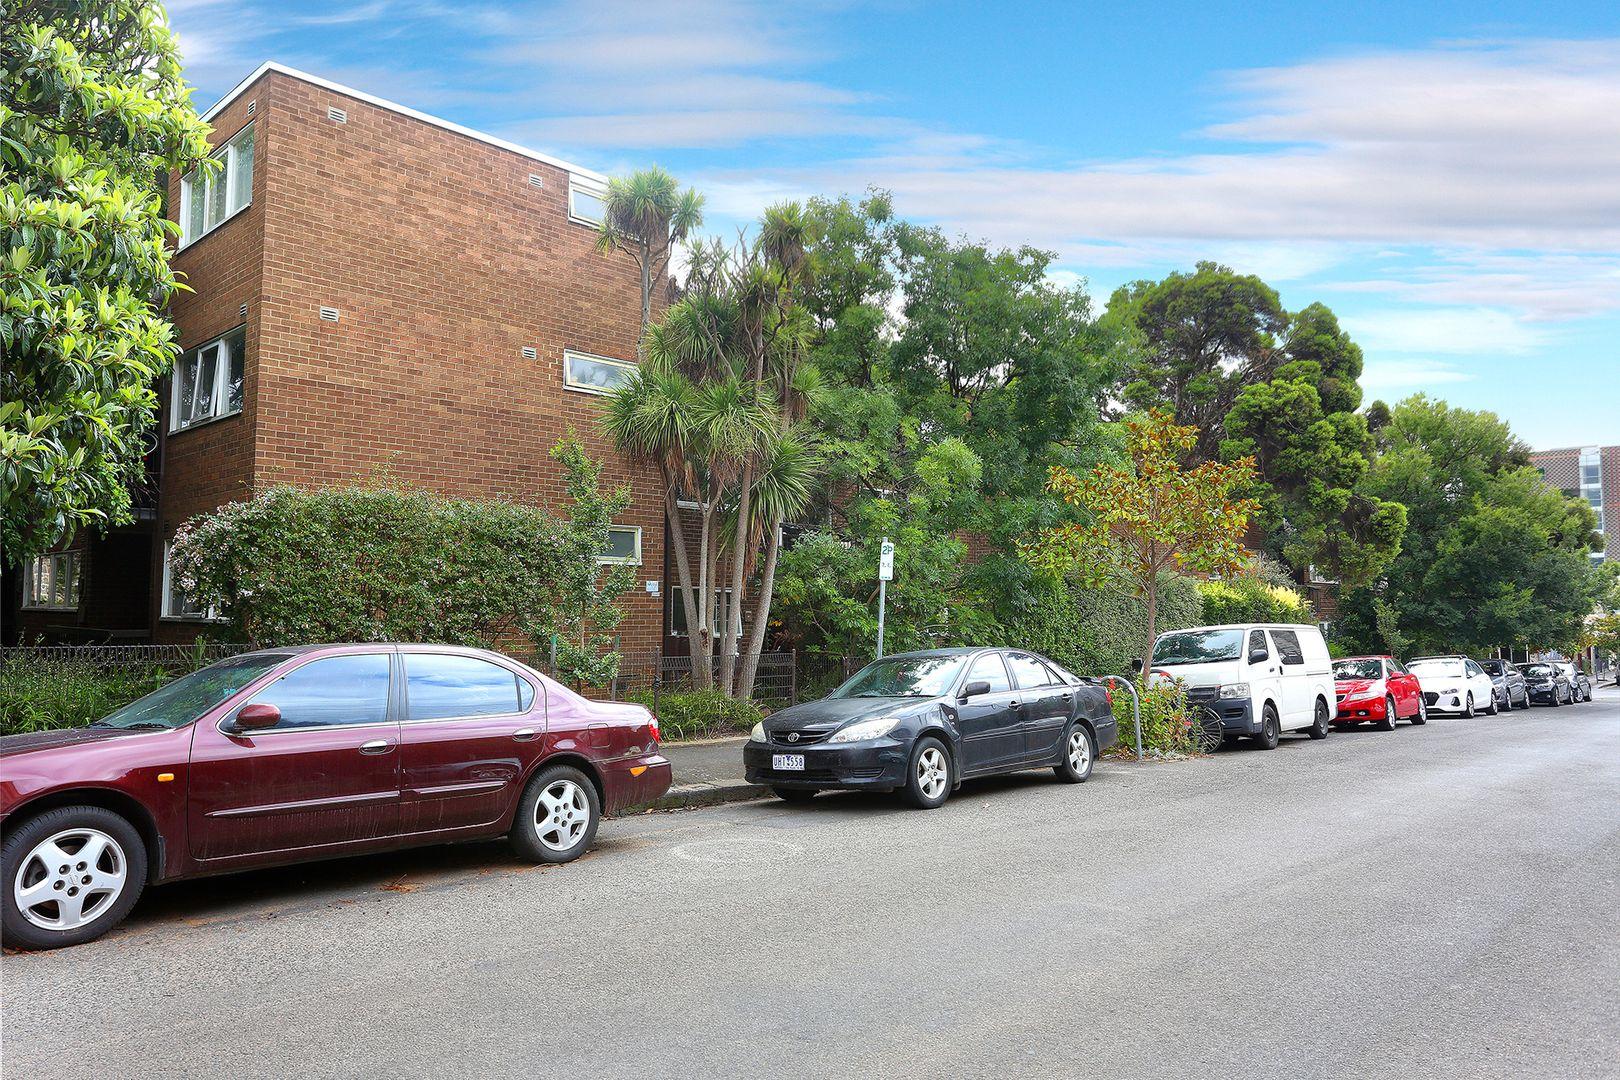 1/41 Hanover Street, Fitzroy VIC 3065, Image 0